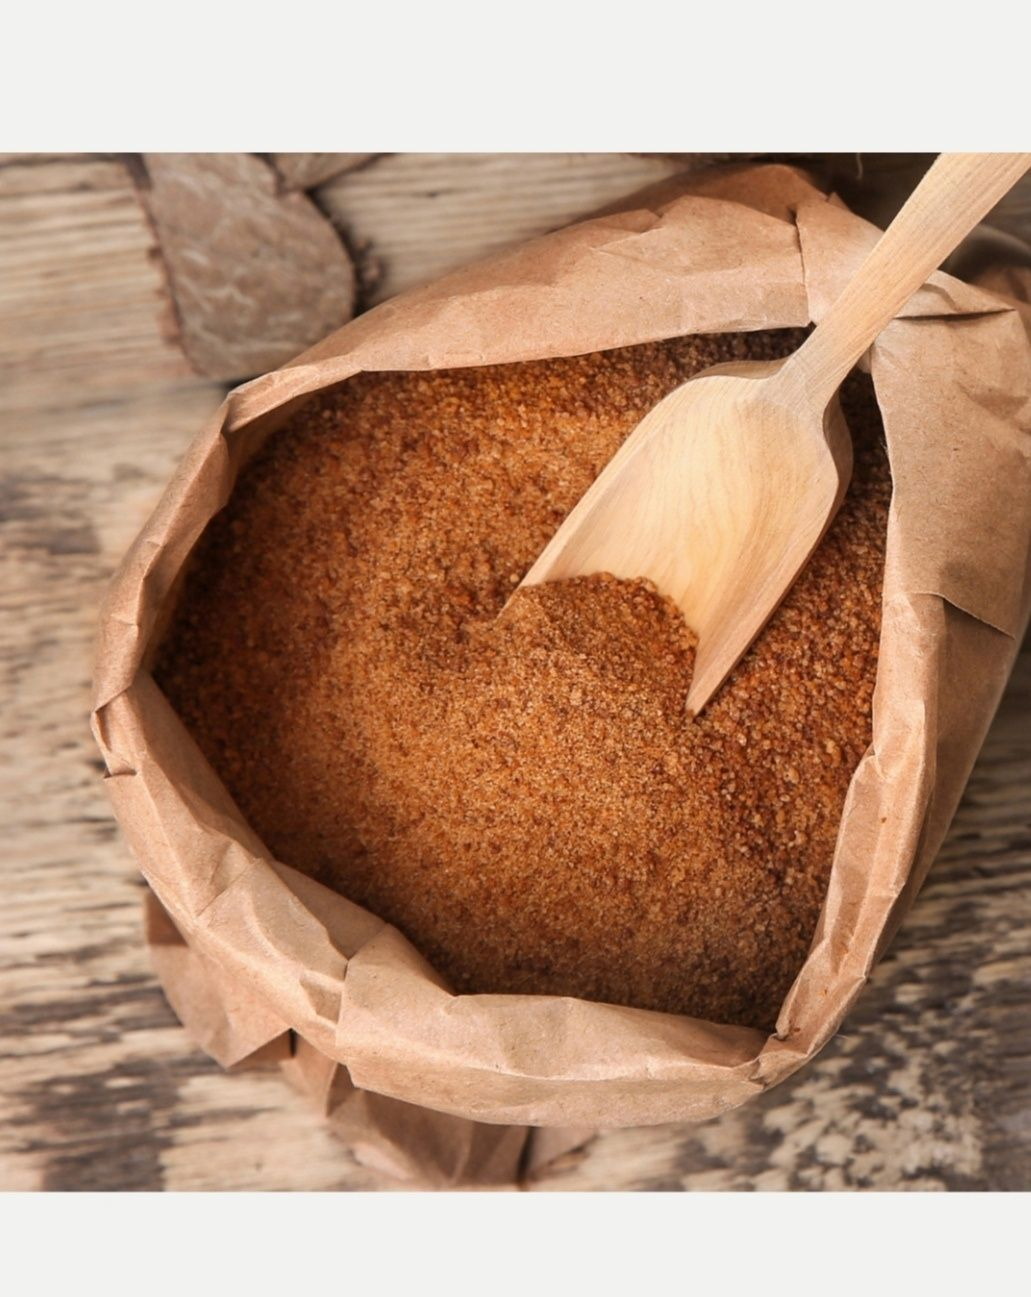 Кокосовый сахар  240грн/кг